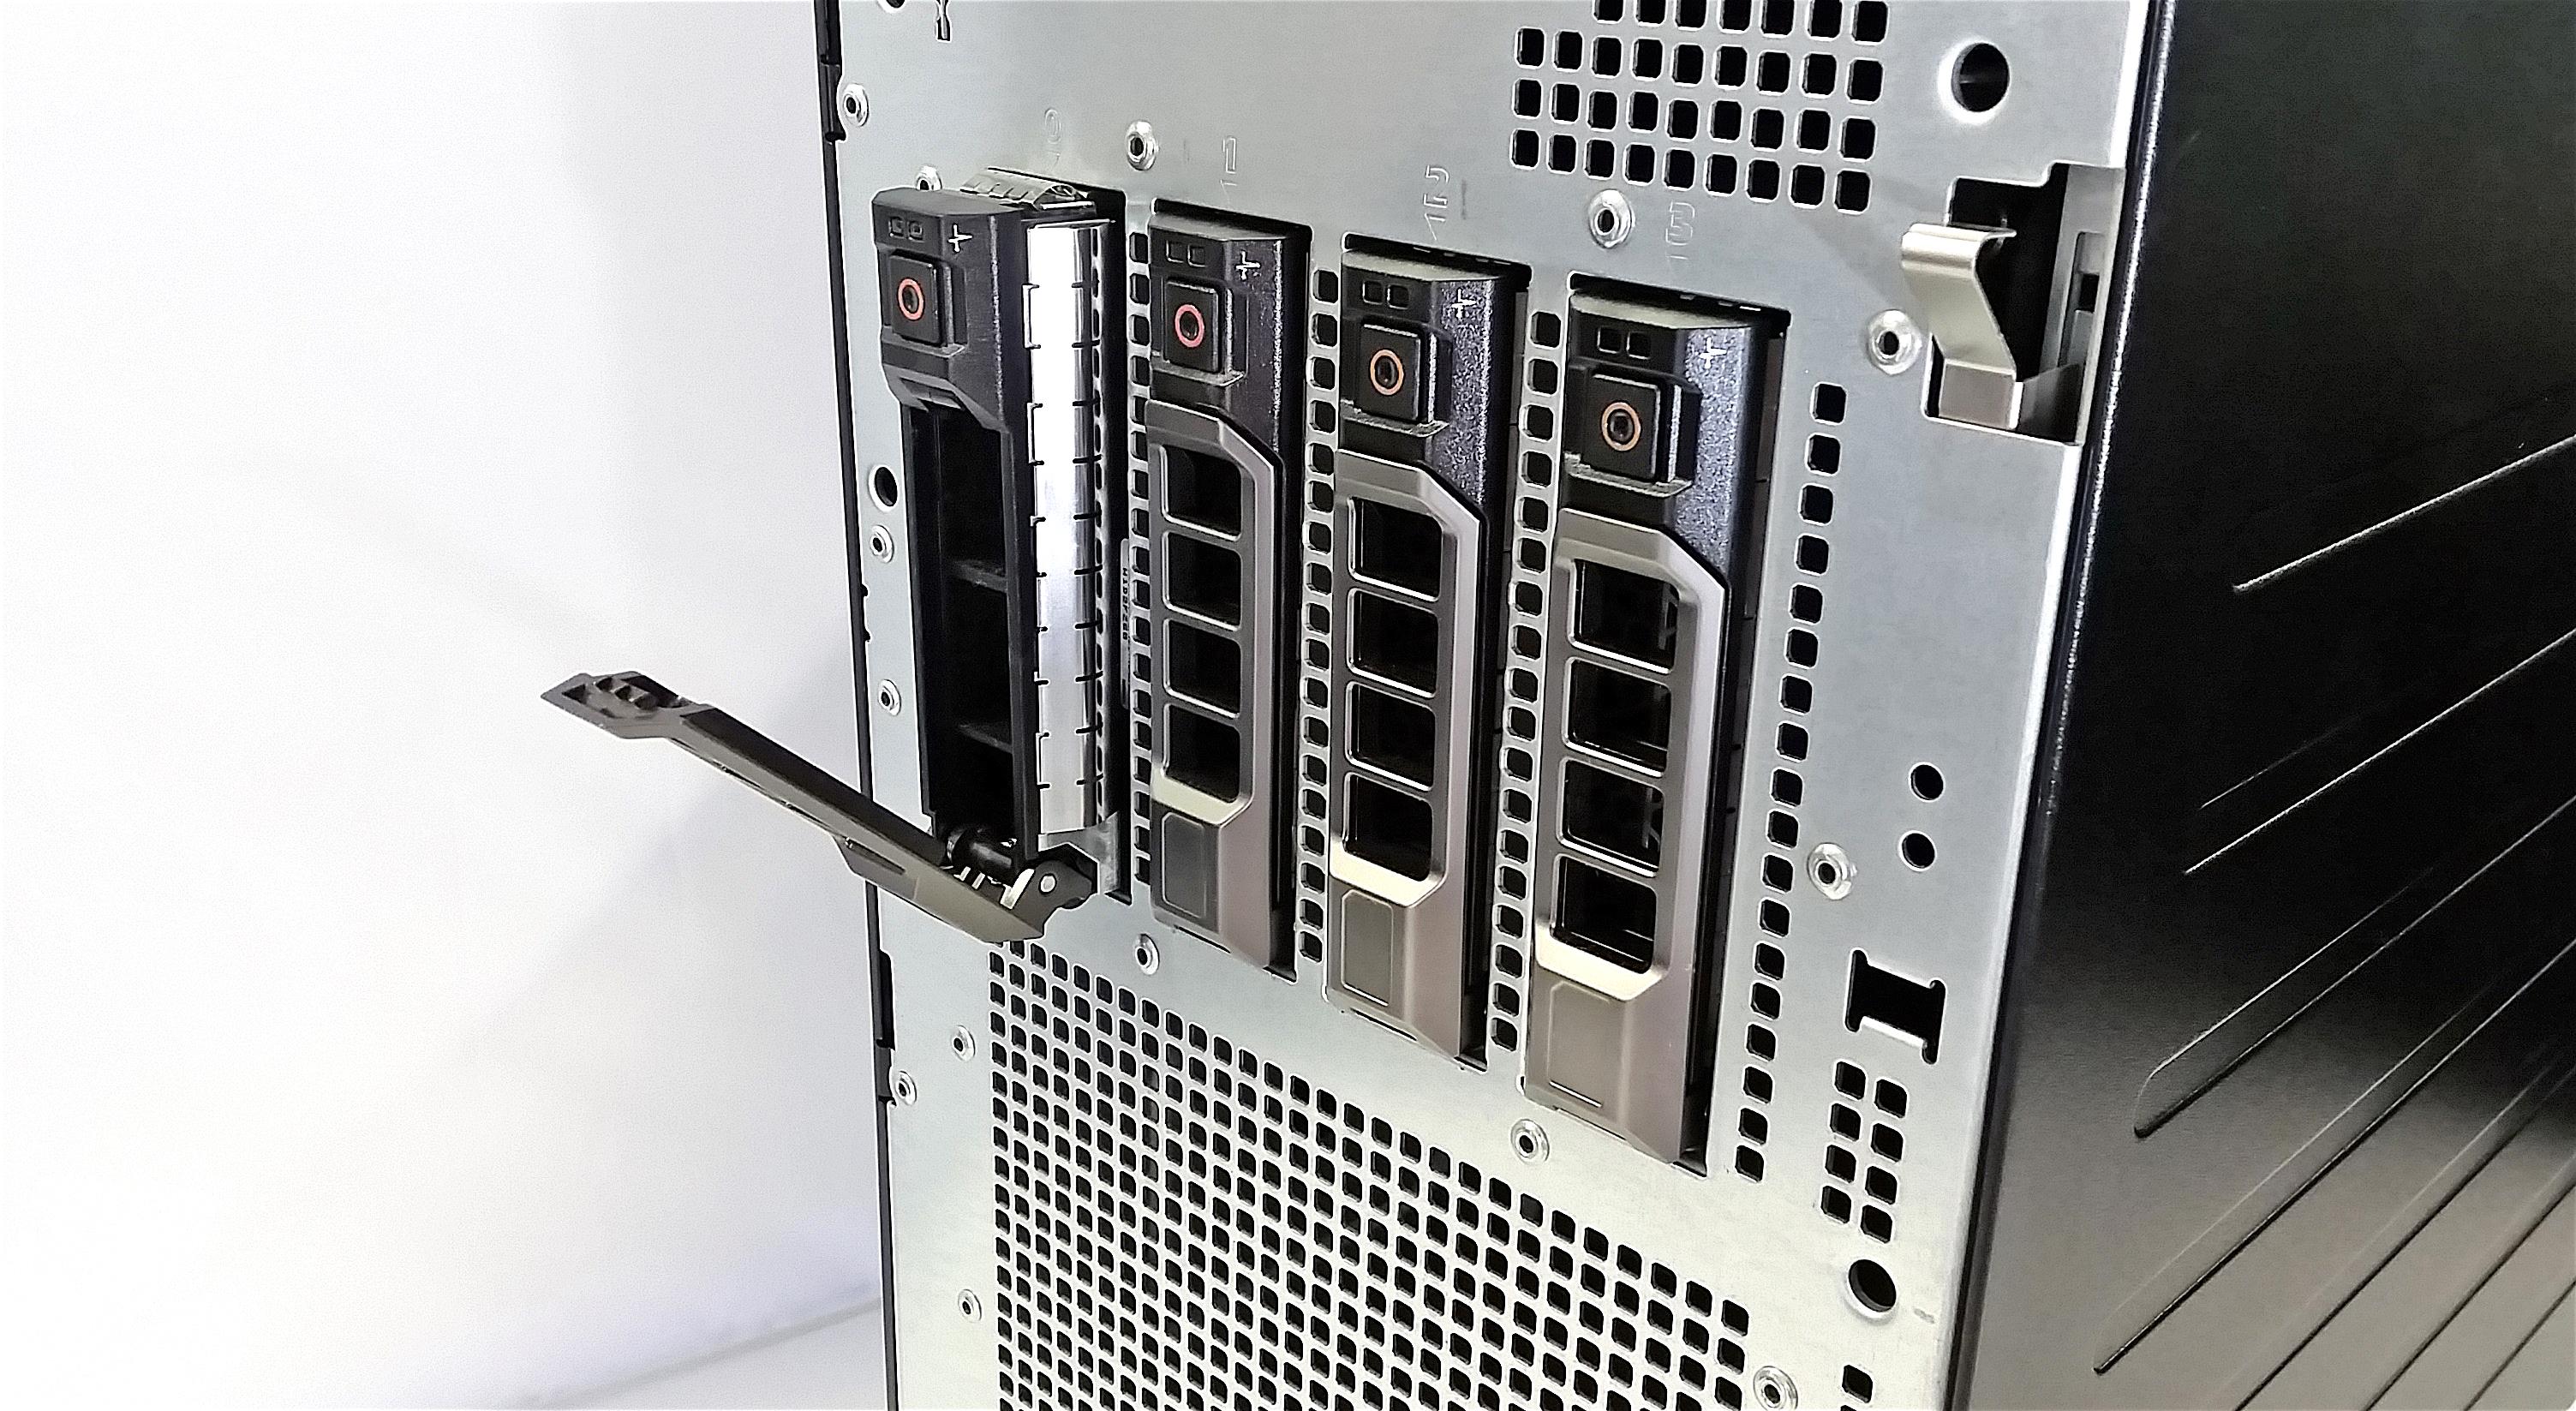 r310 server